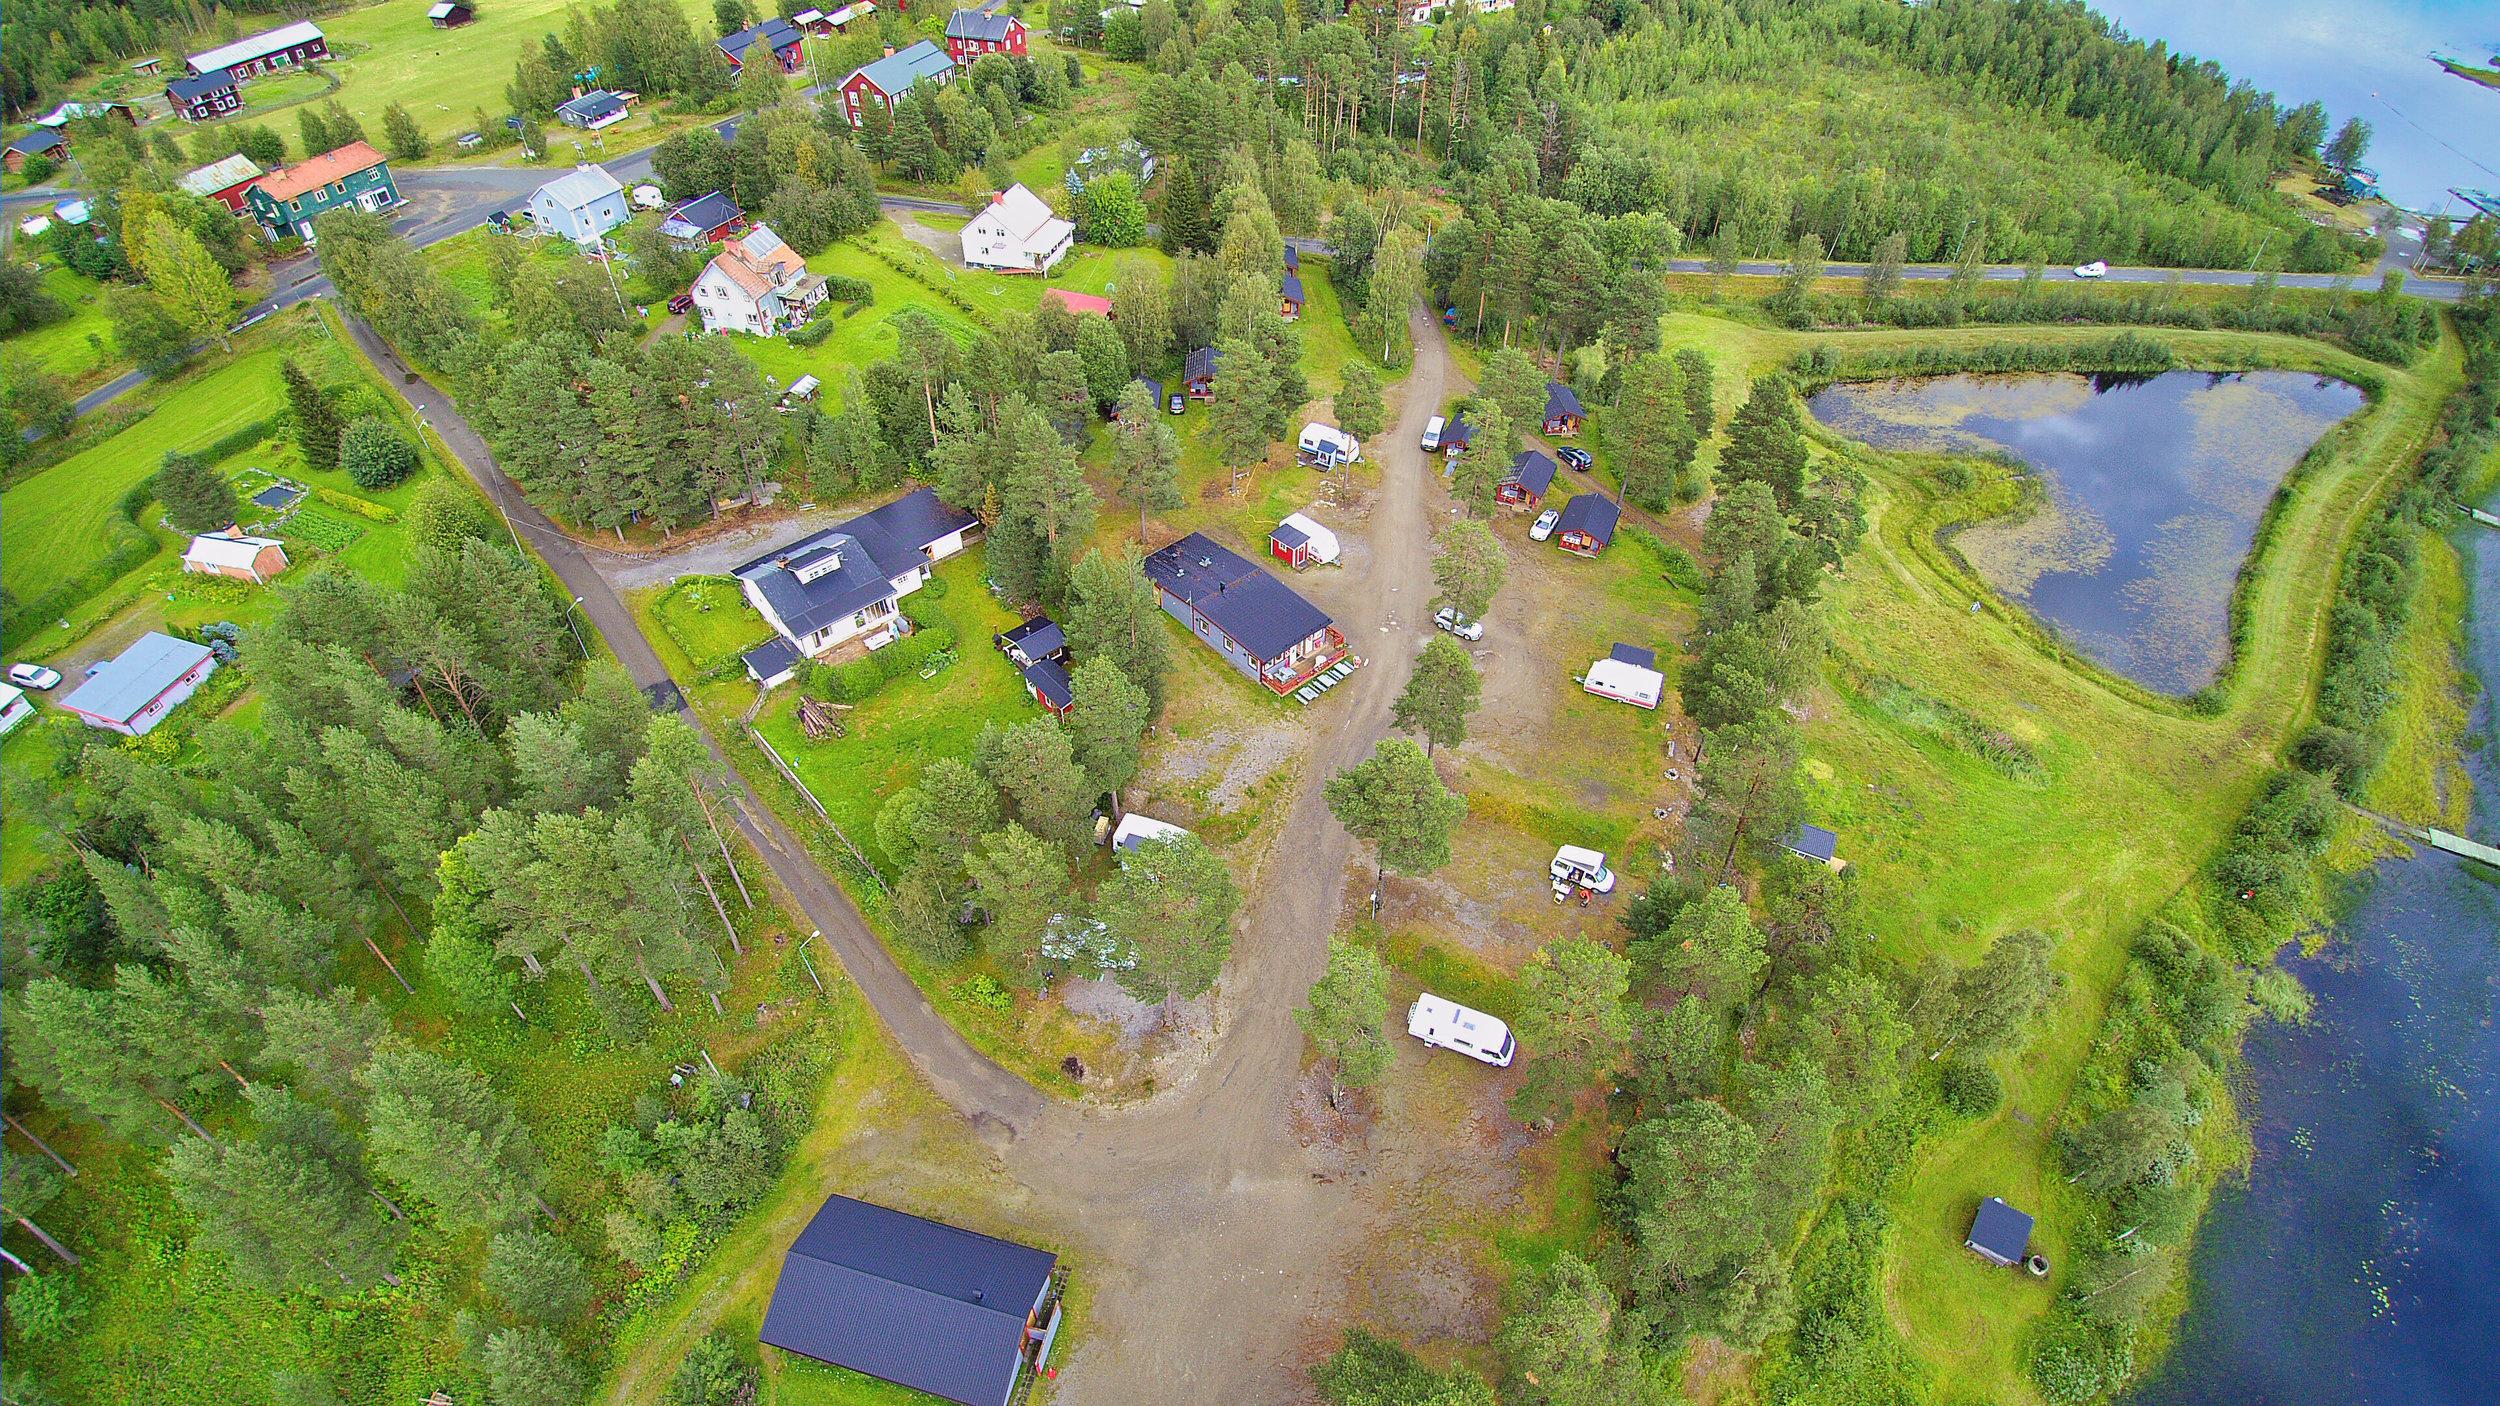 Flygfoto Sonfjällcampen 2016-08-09 (3).jpeg